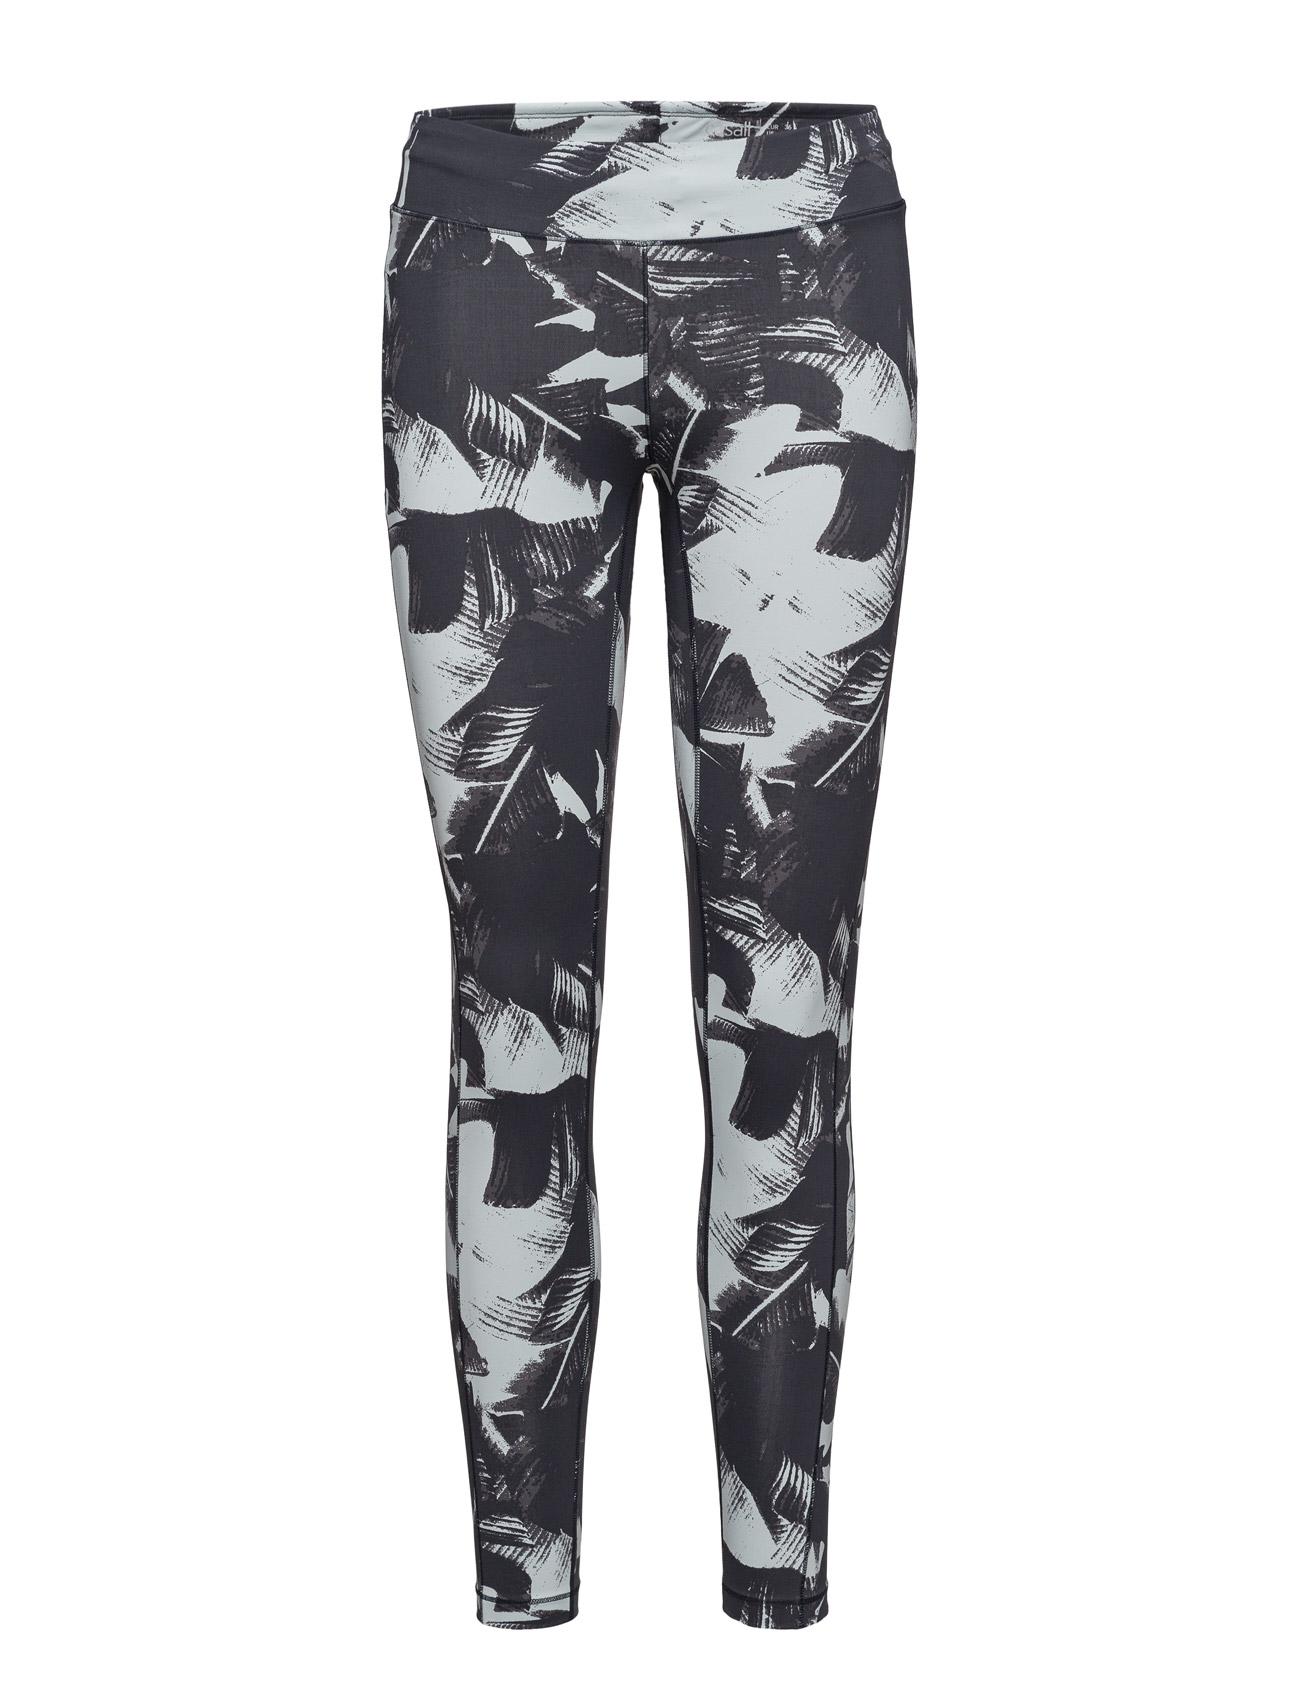 The Palm Print Tights Casall Trænings leggings til Damer i